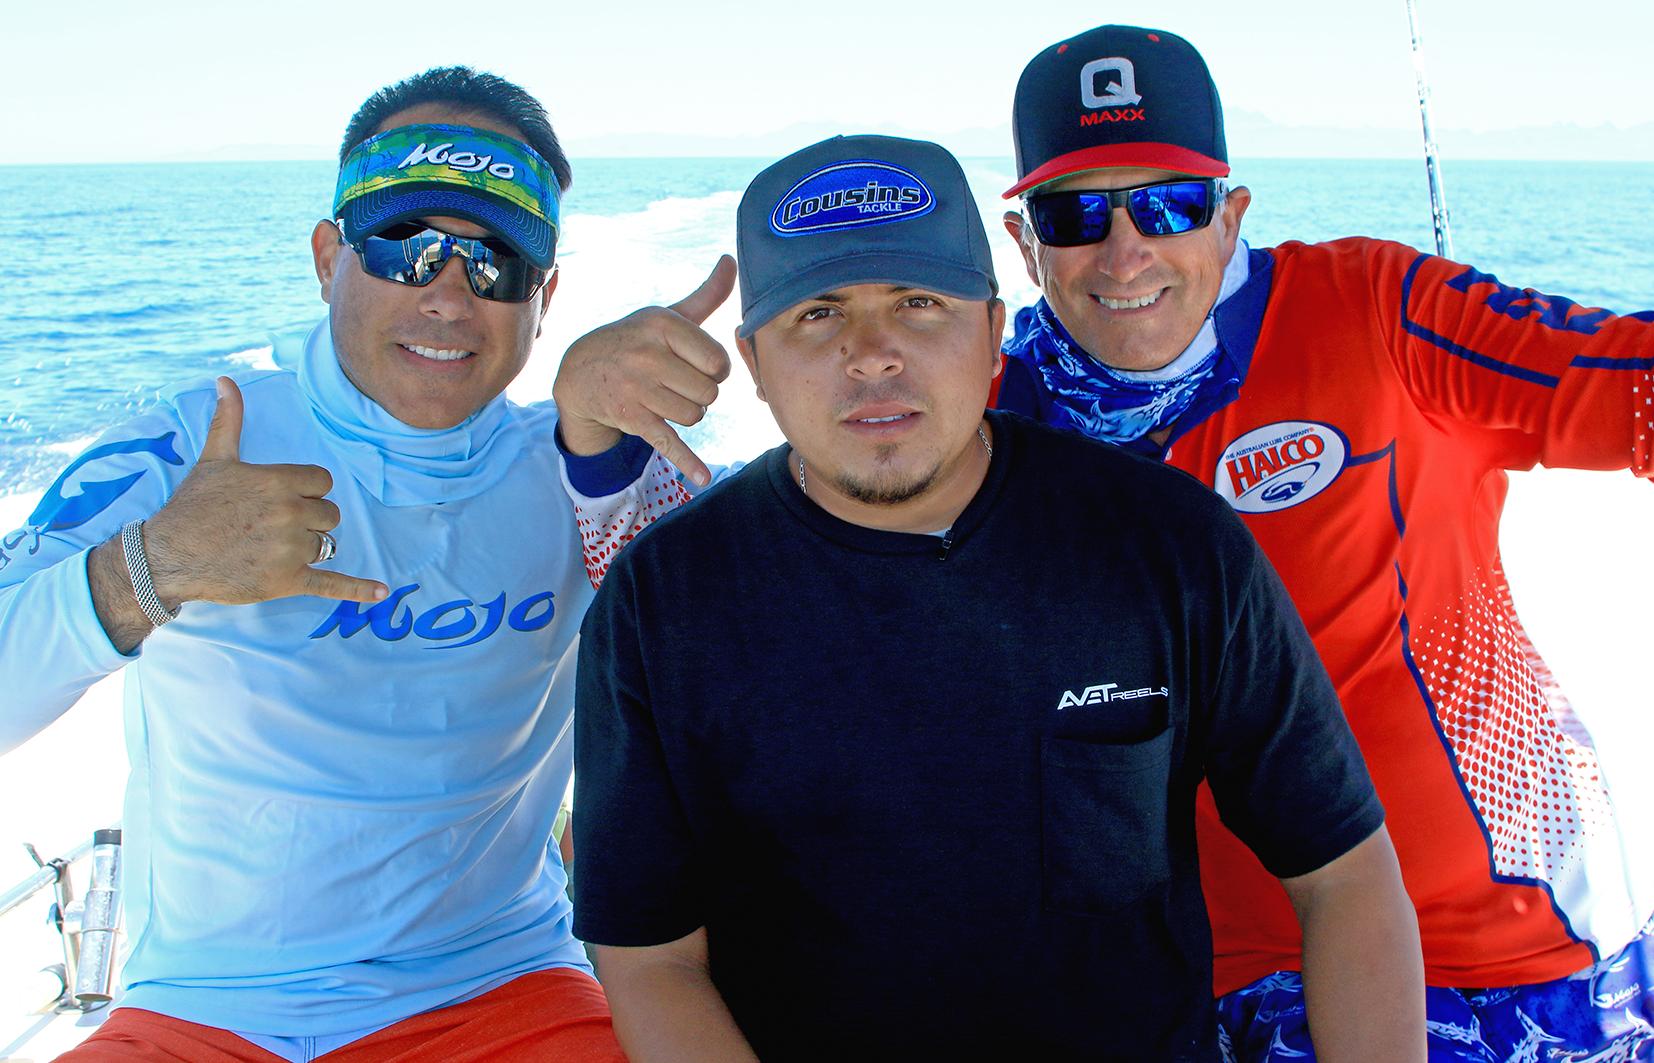 Destino Baja Sur Introduccion A Serie De Tv